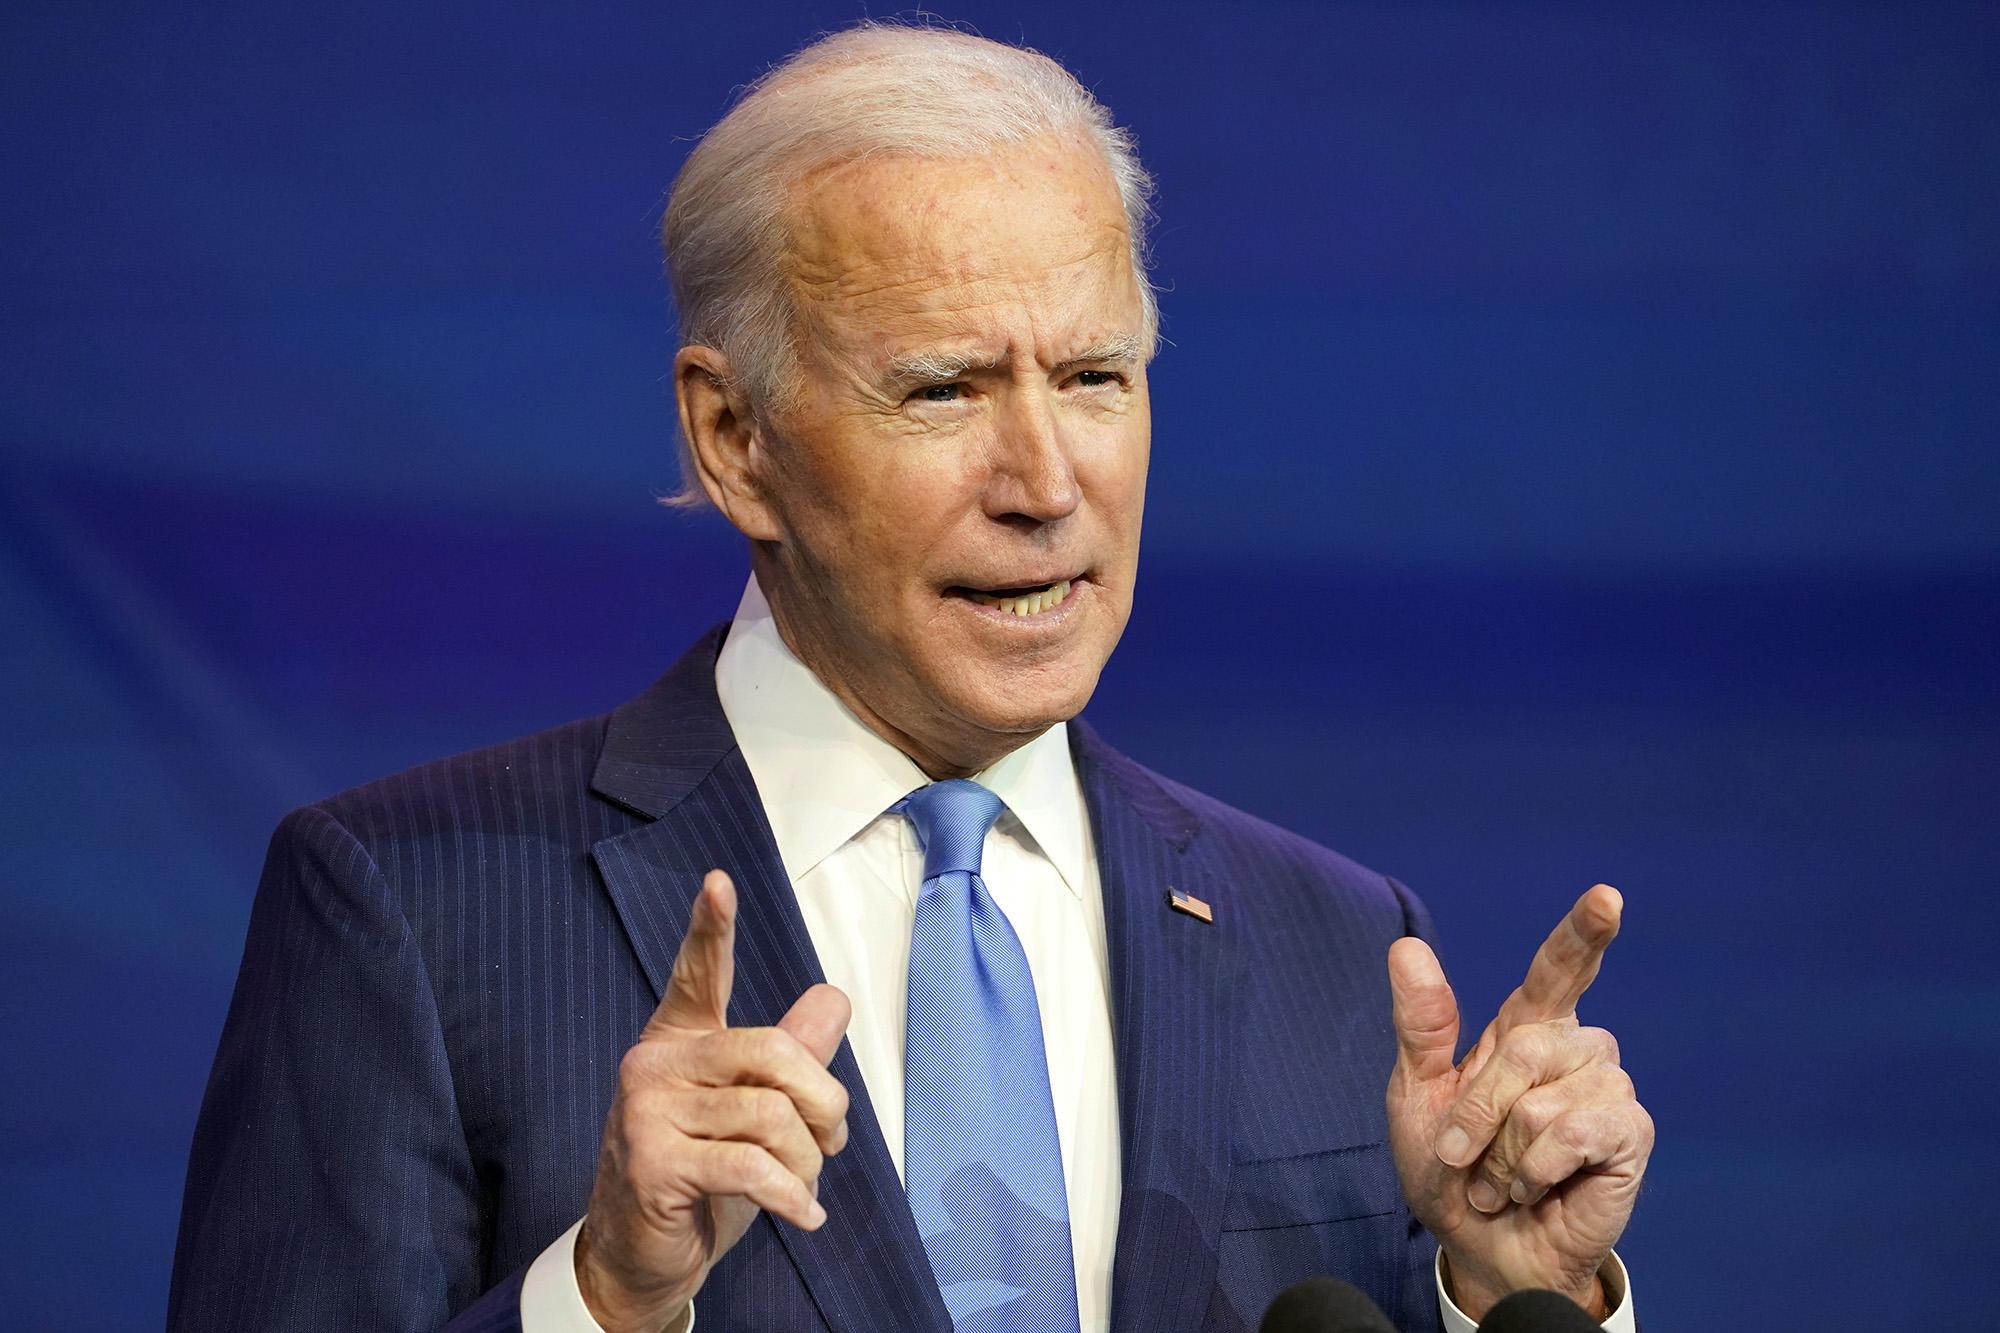 Joe Biden 'proud' of son Hunter amid China, federal probe